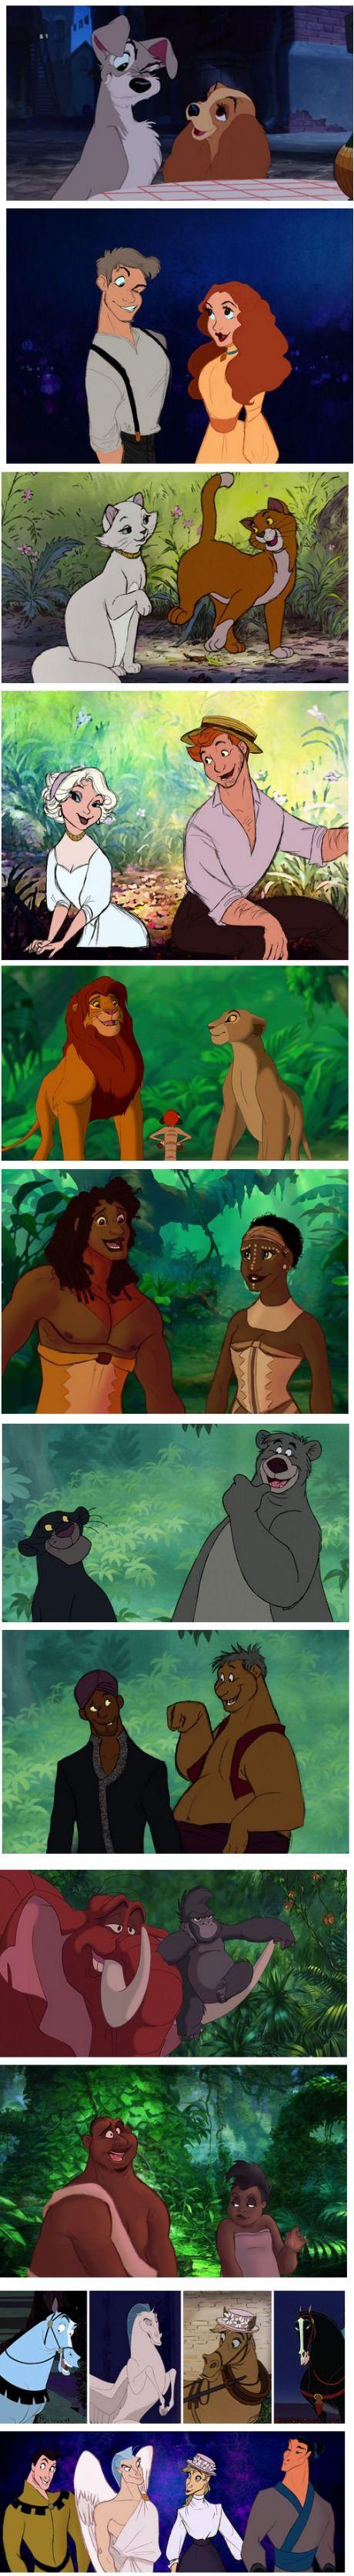 Disney animals and their human form (By Alaina Bastian)